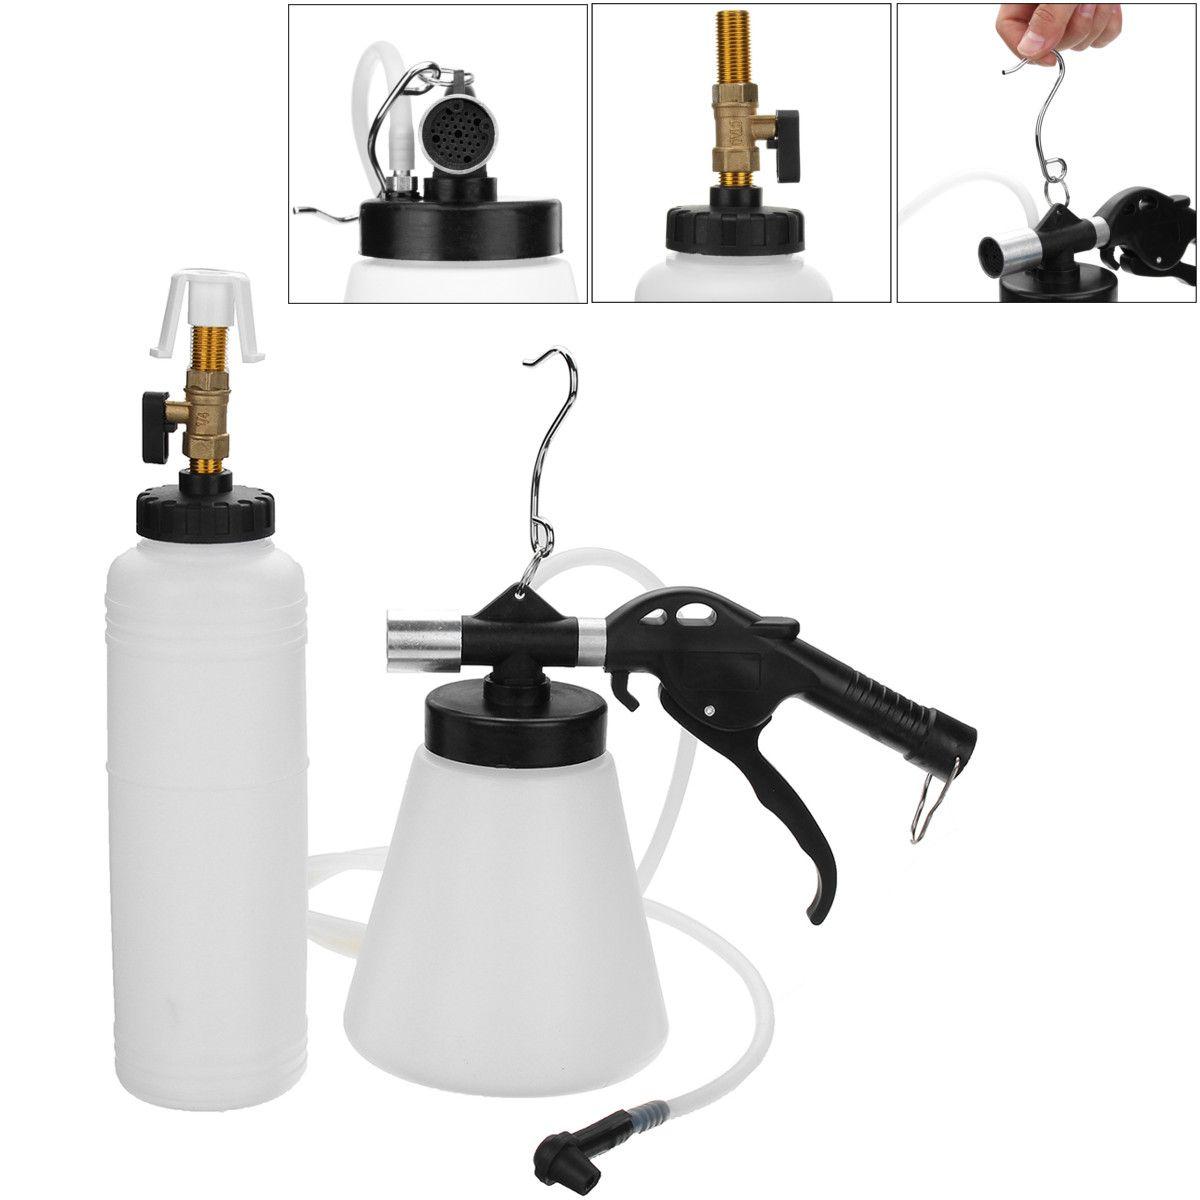 1L Air Brake Bleeder Kit Pneumatic Brake Clutch 90-120 PSI Vacuum Hydraulic Fluid Fill Bottle Set Car Accessories